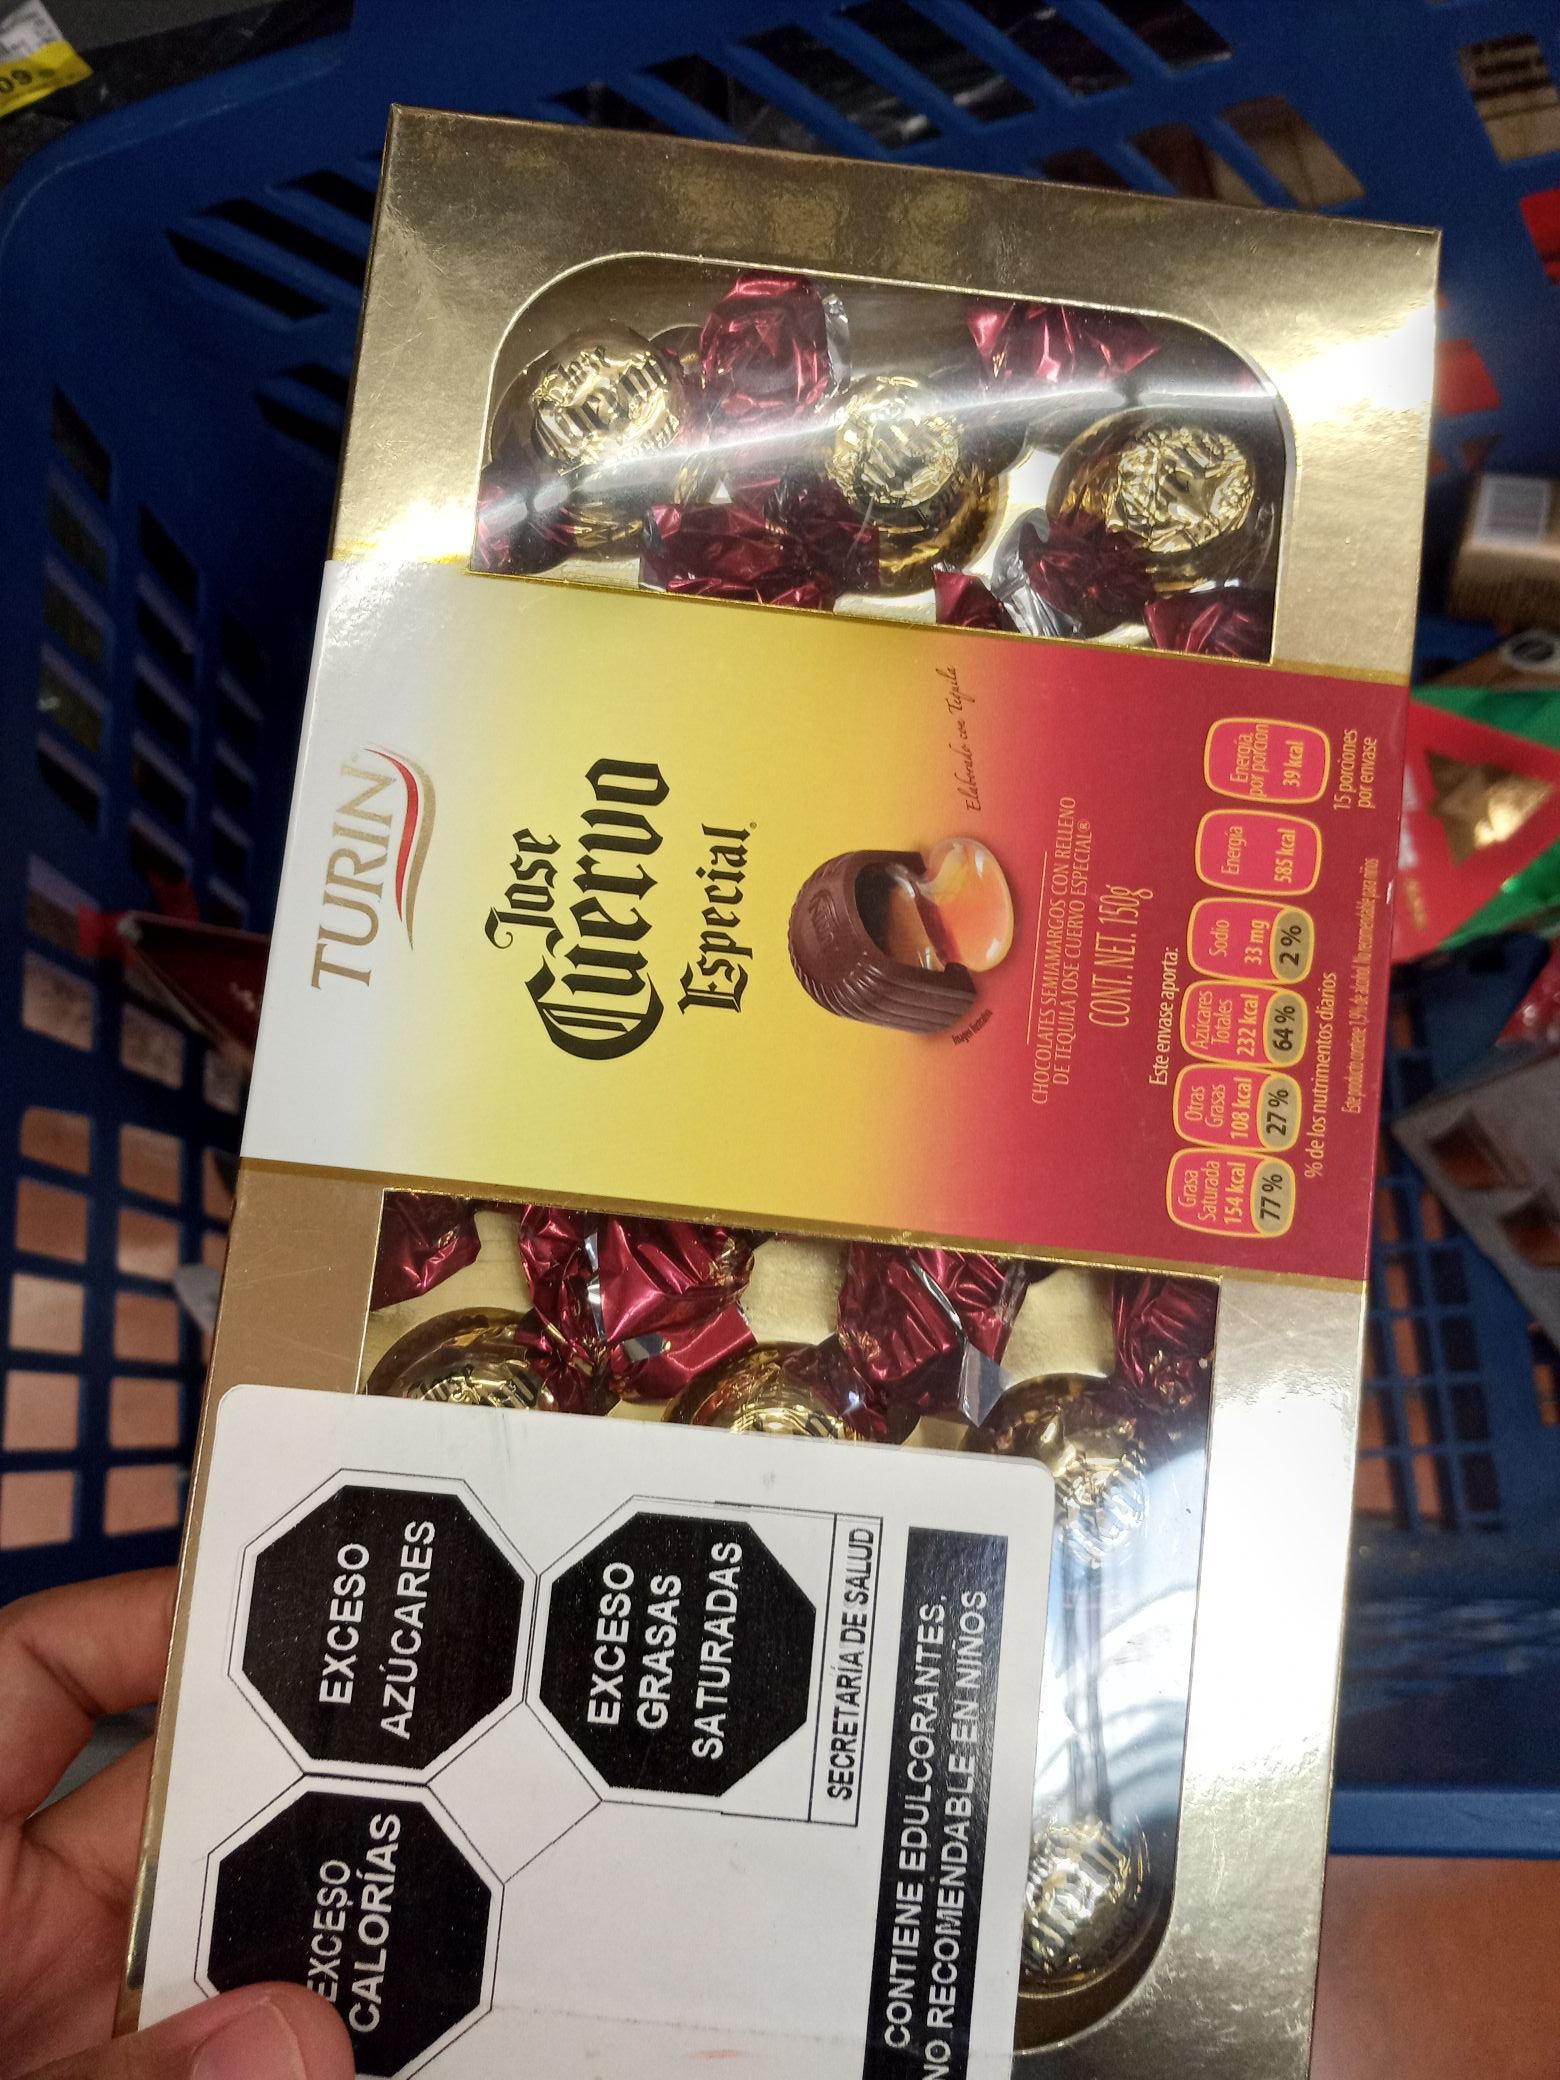 Walmart: Chocolate Jose cuervo Gratis, con mini promonovela